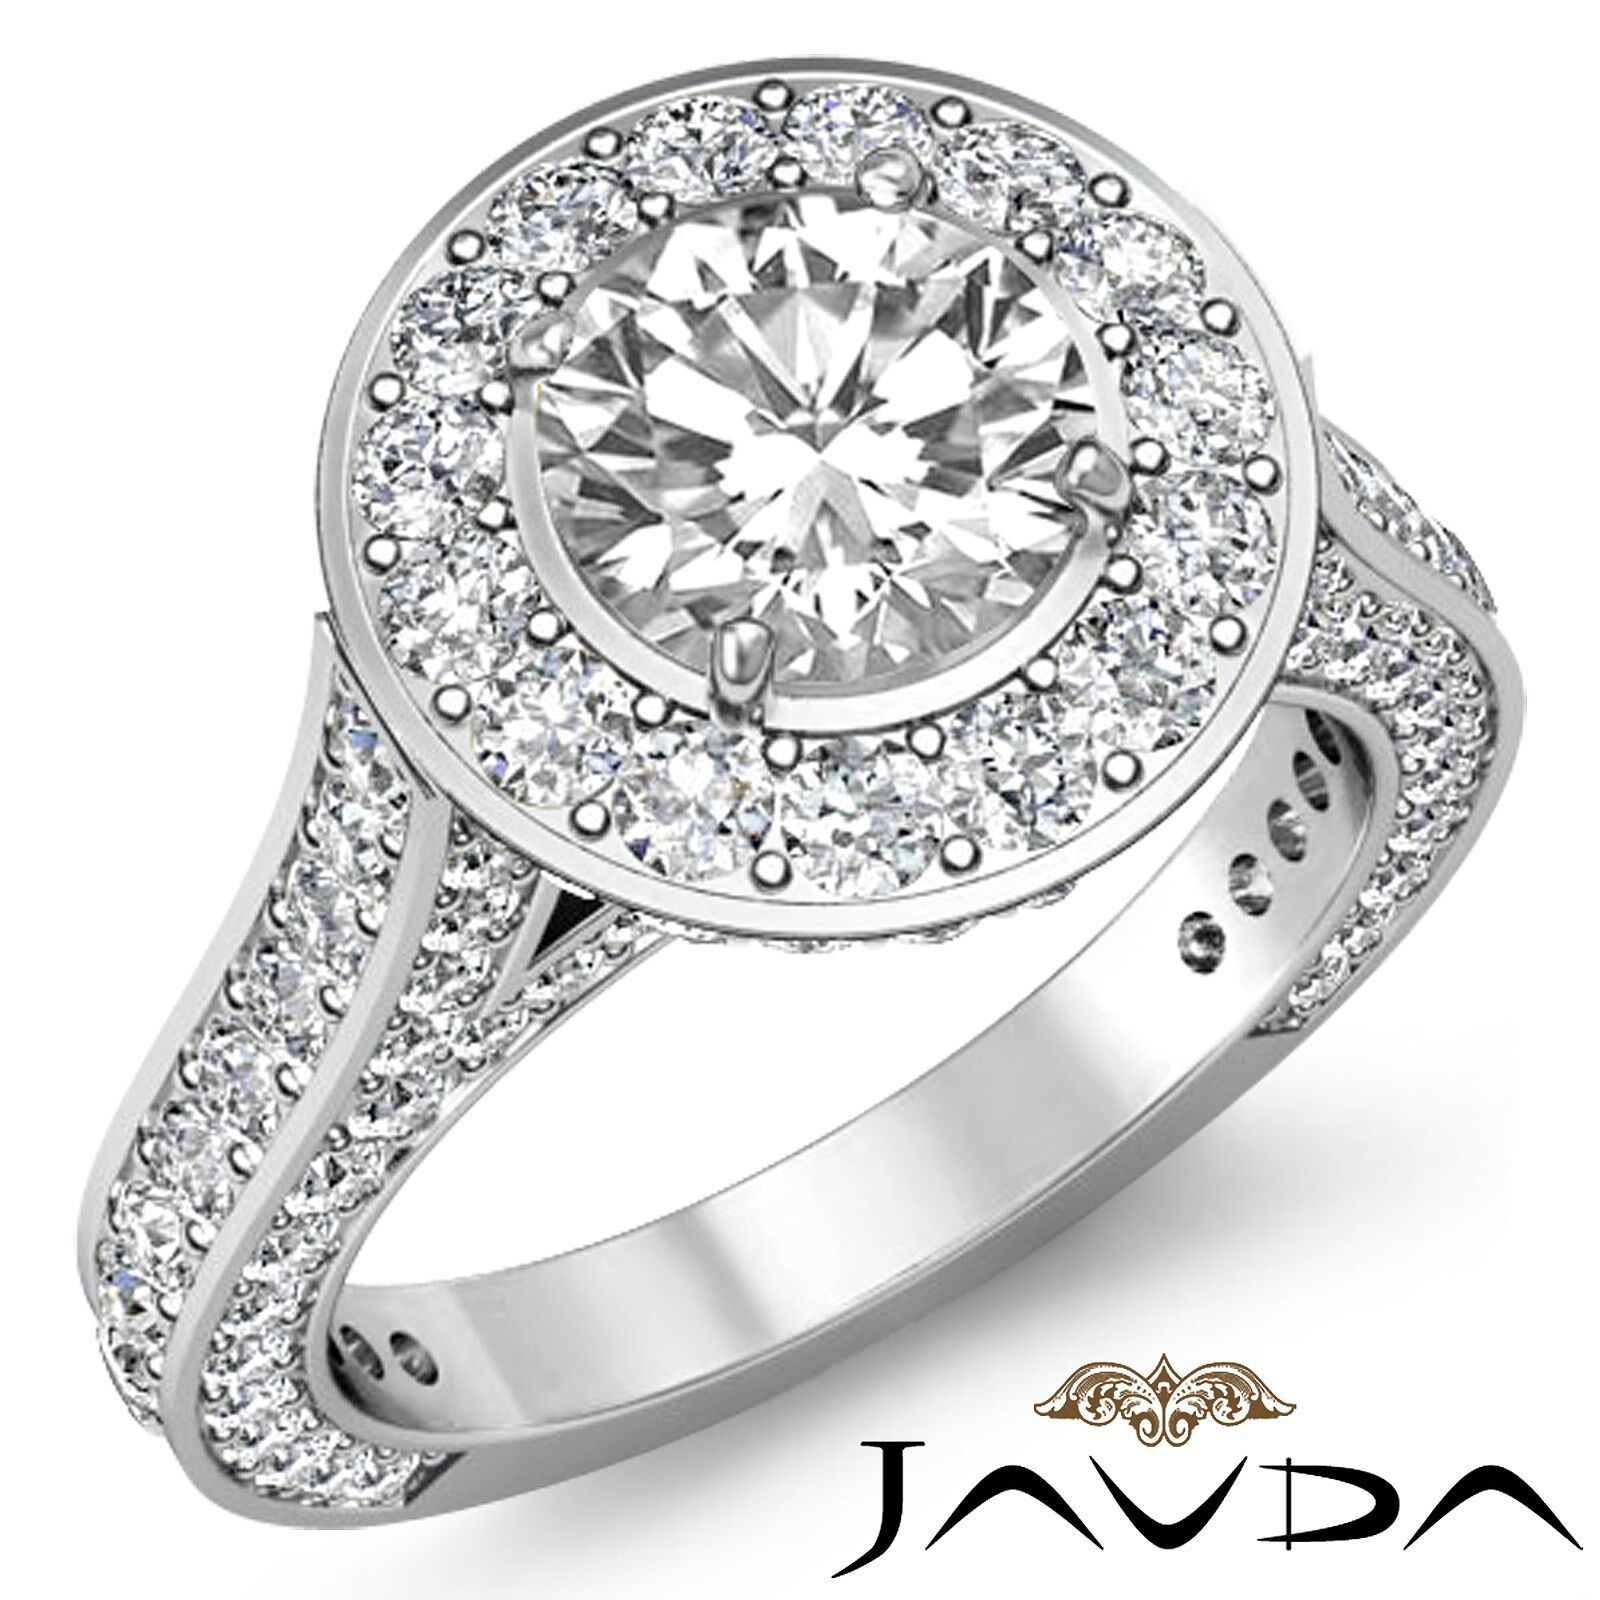 Bridge Accent Halo Round Cut Diamond Engagement Micro Pave Ring GIA H VS1 3.6Ct